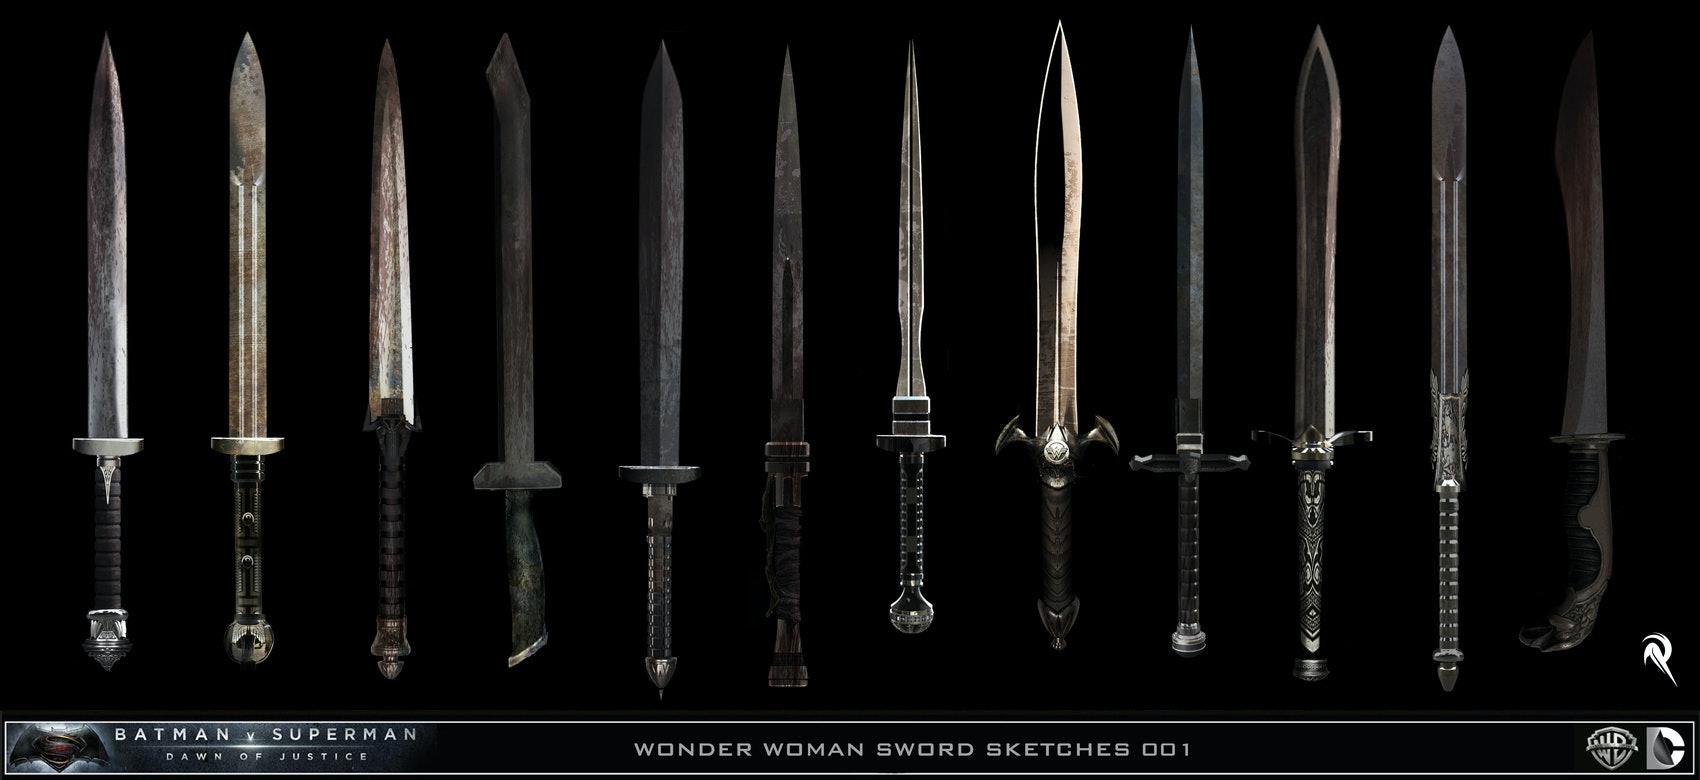 Designs for Wonder Woman's Sword in Batman v Superman